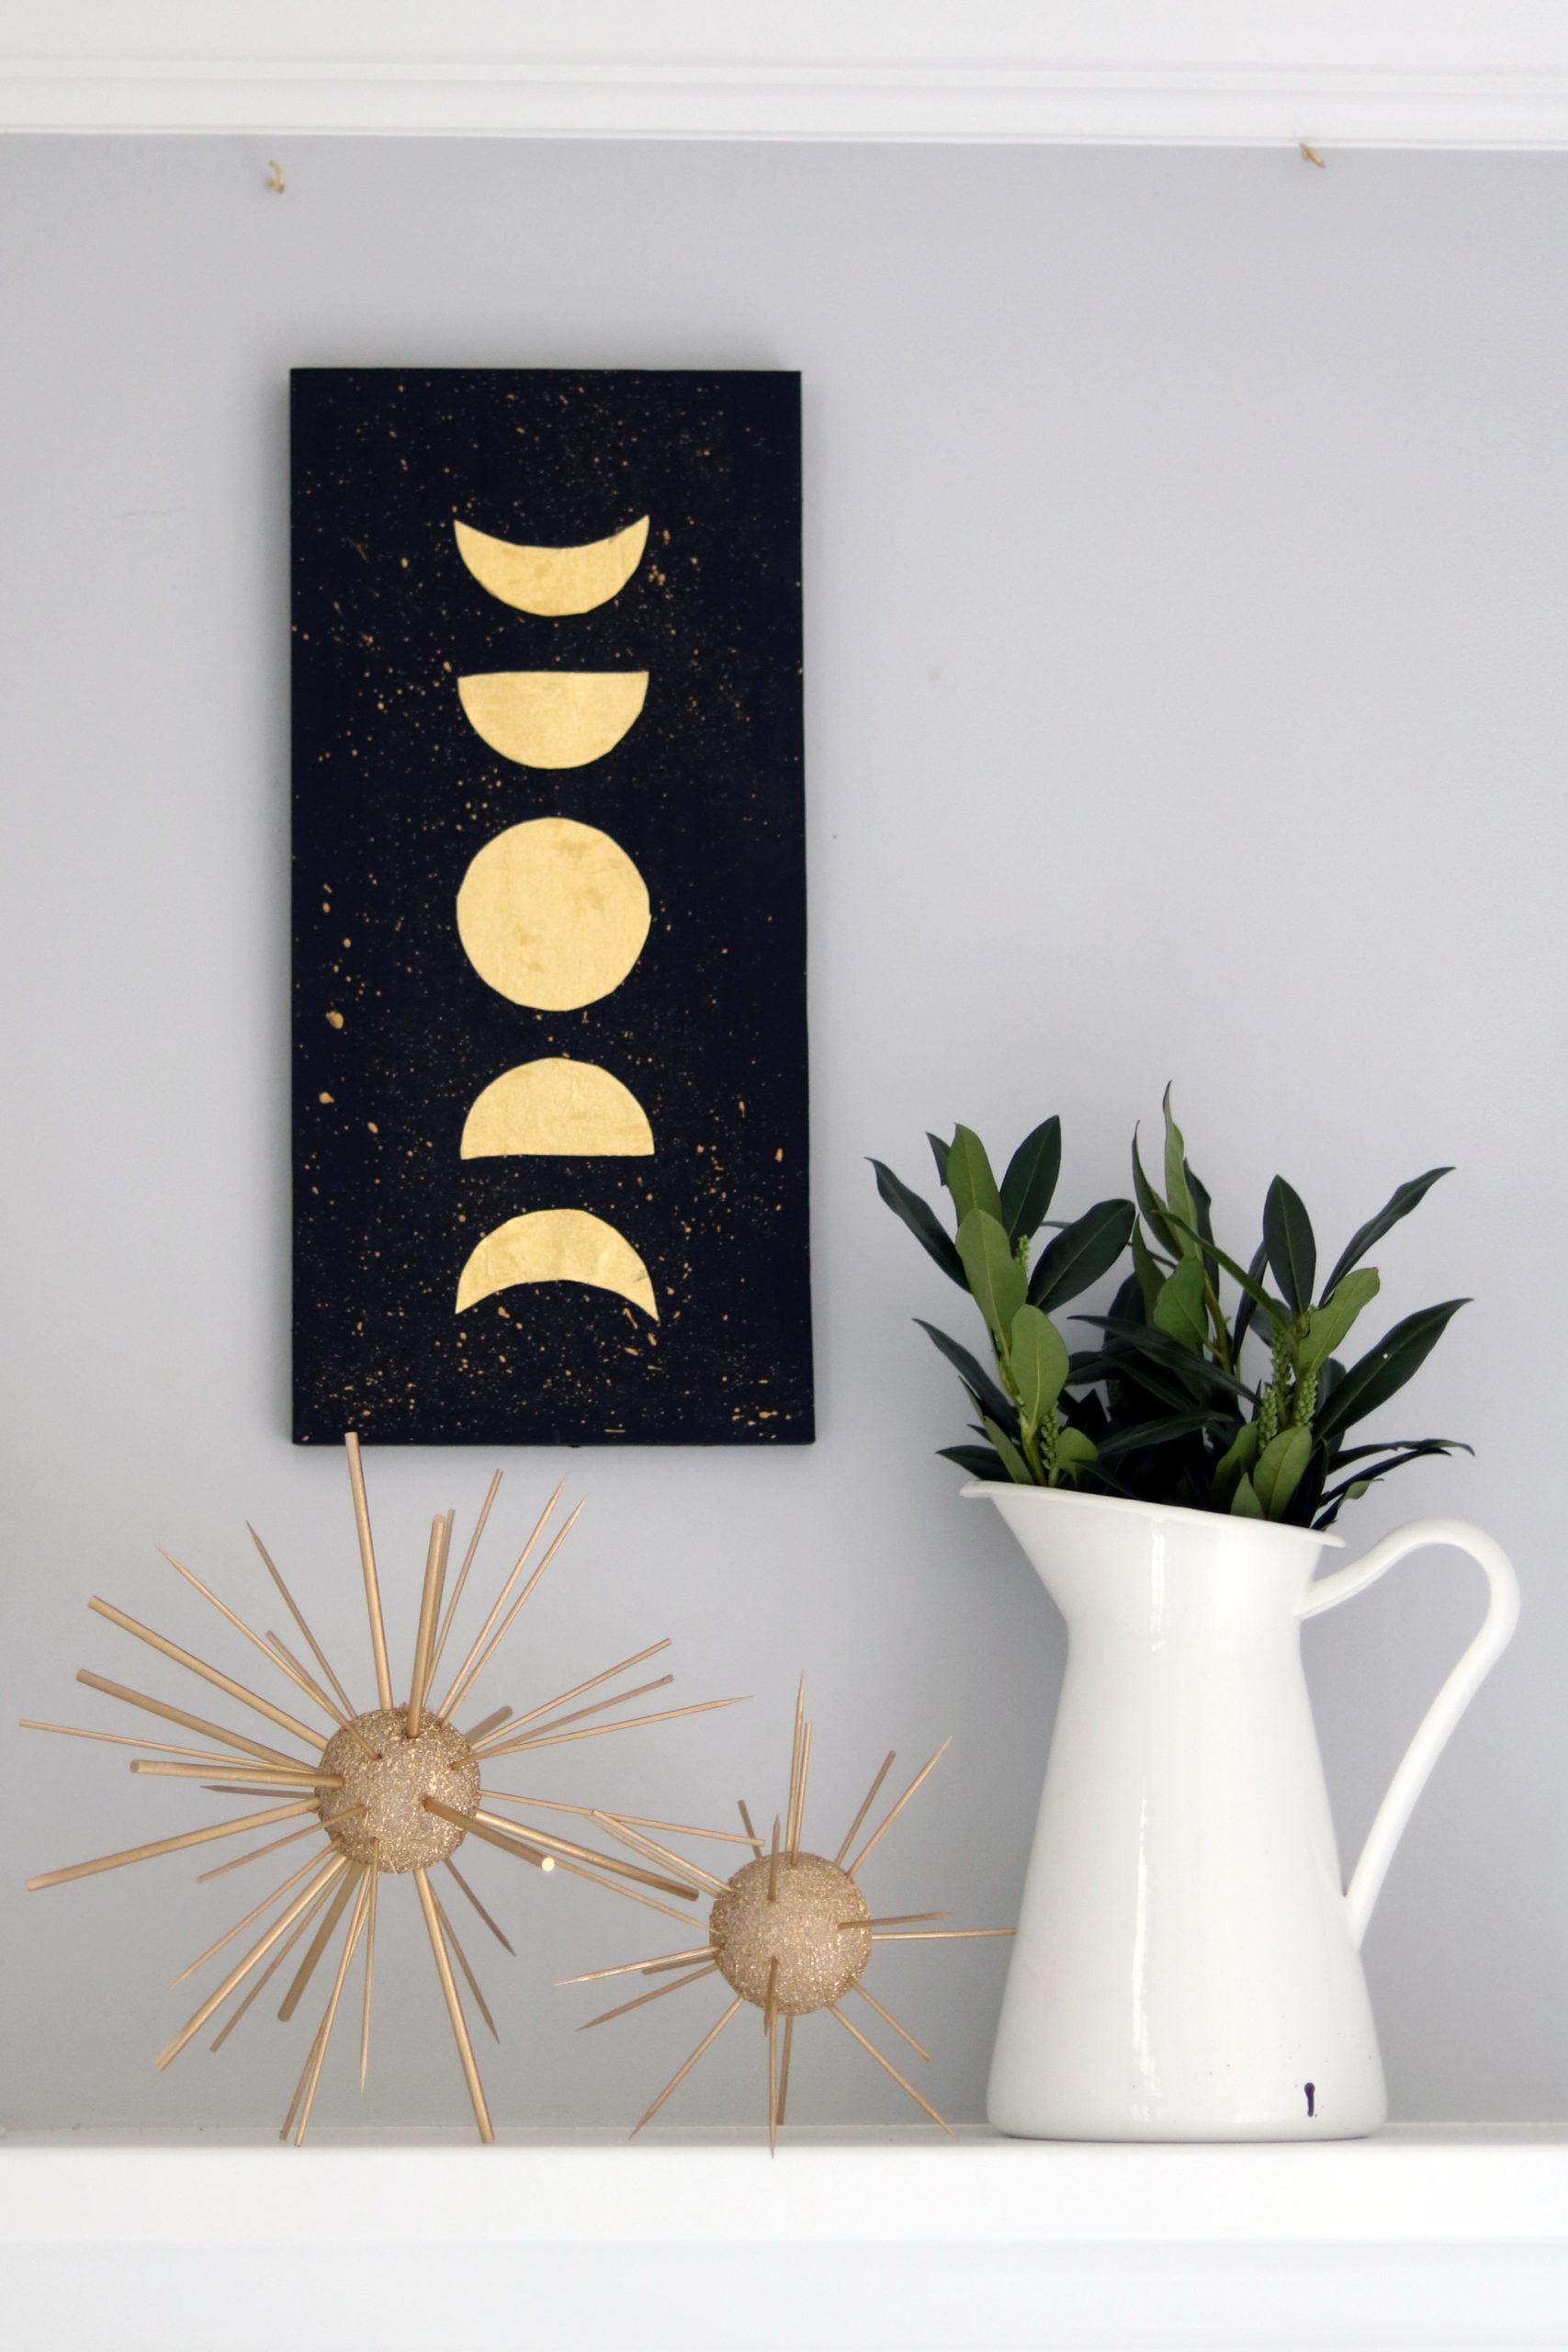 DIY Moon Phase Wall Art